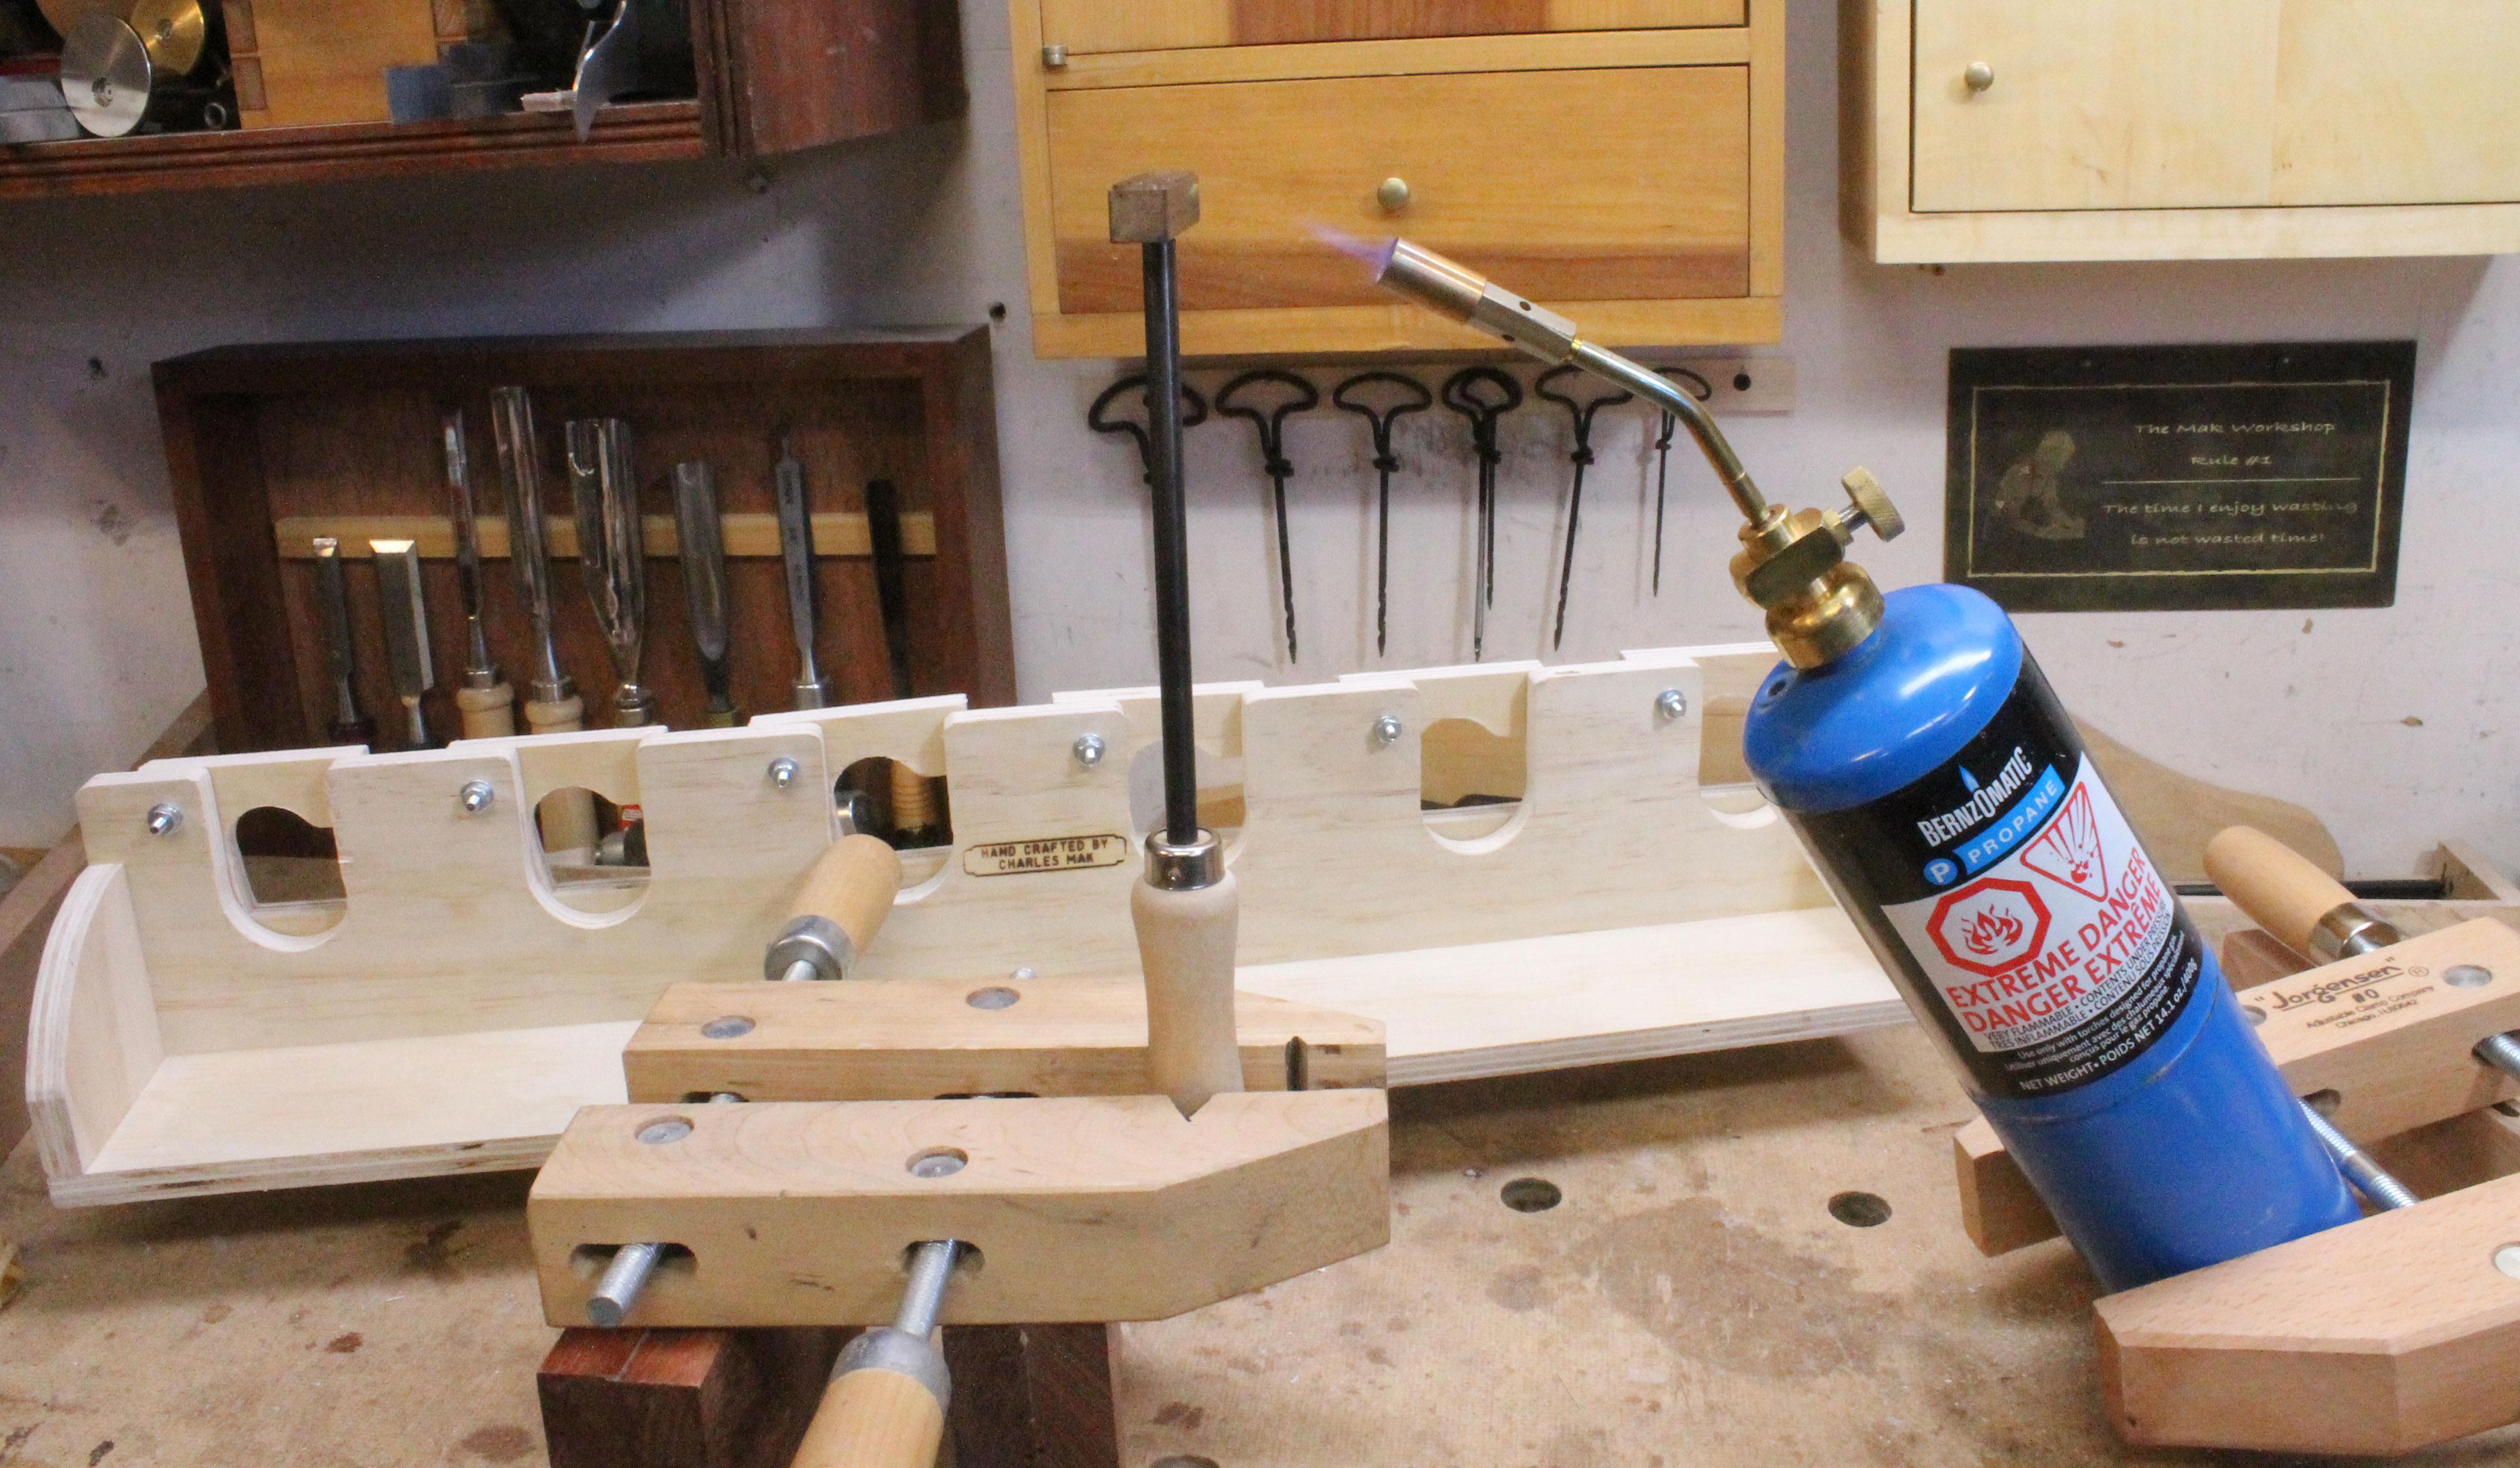 Branding the tool rack.